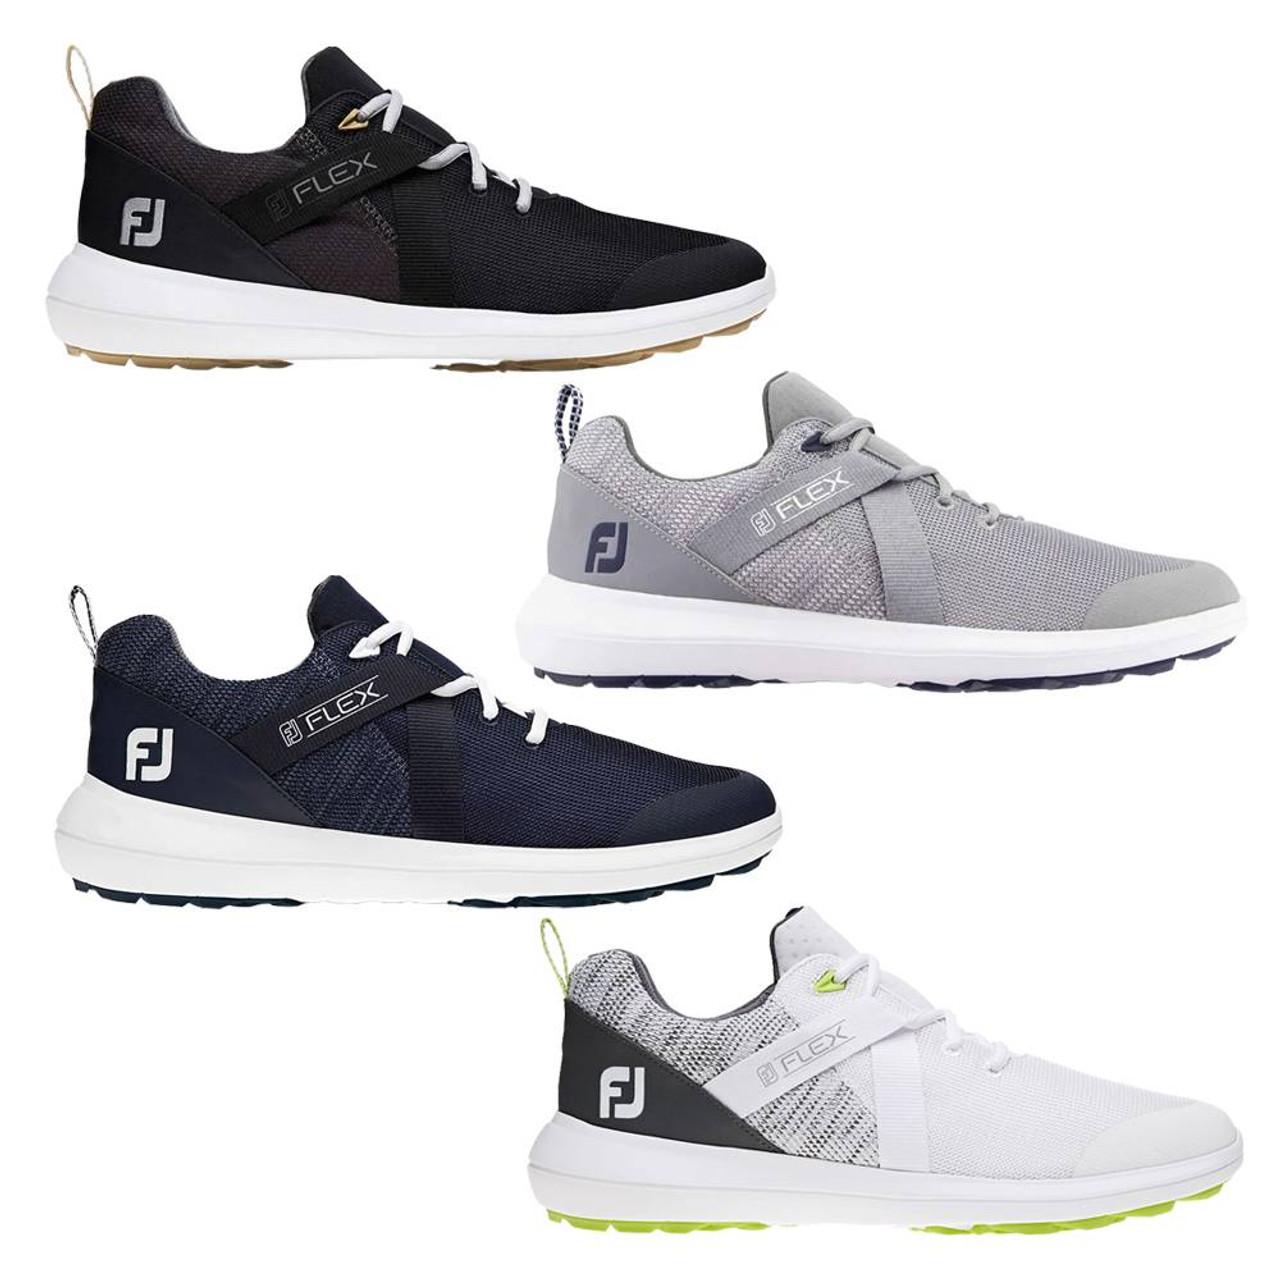 FootJoy FJ Flex Spikeless Golf Shoes